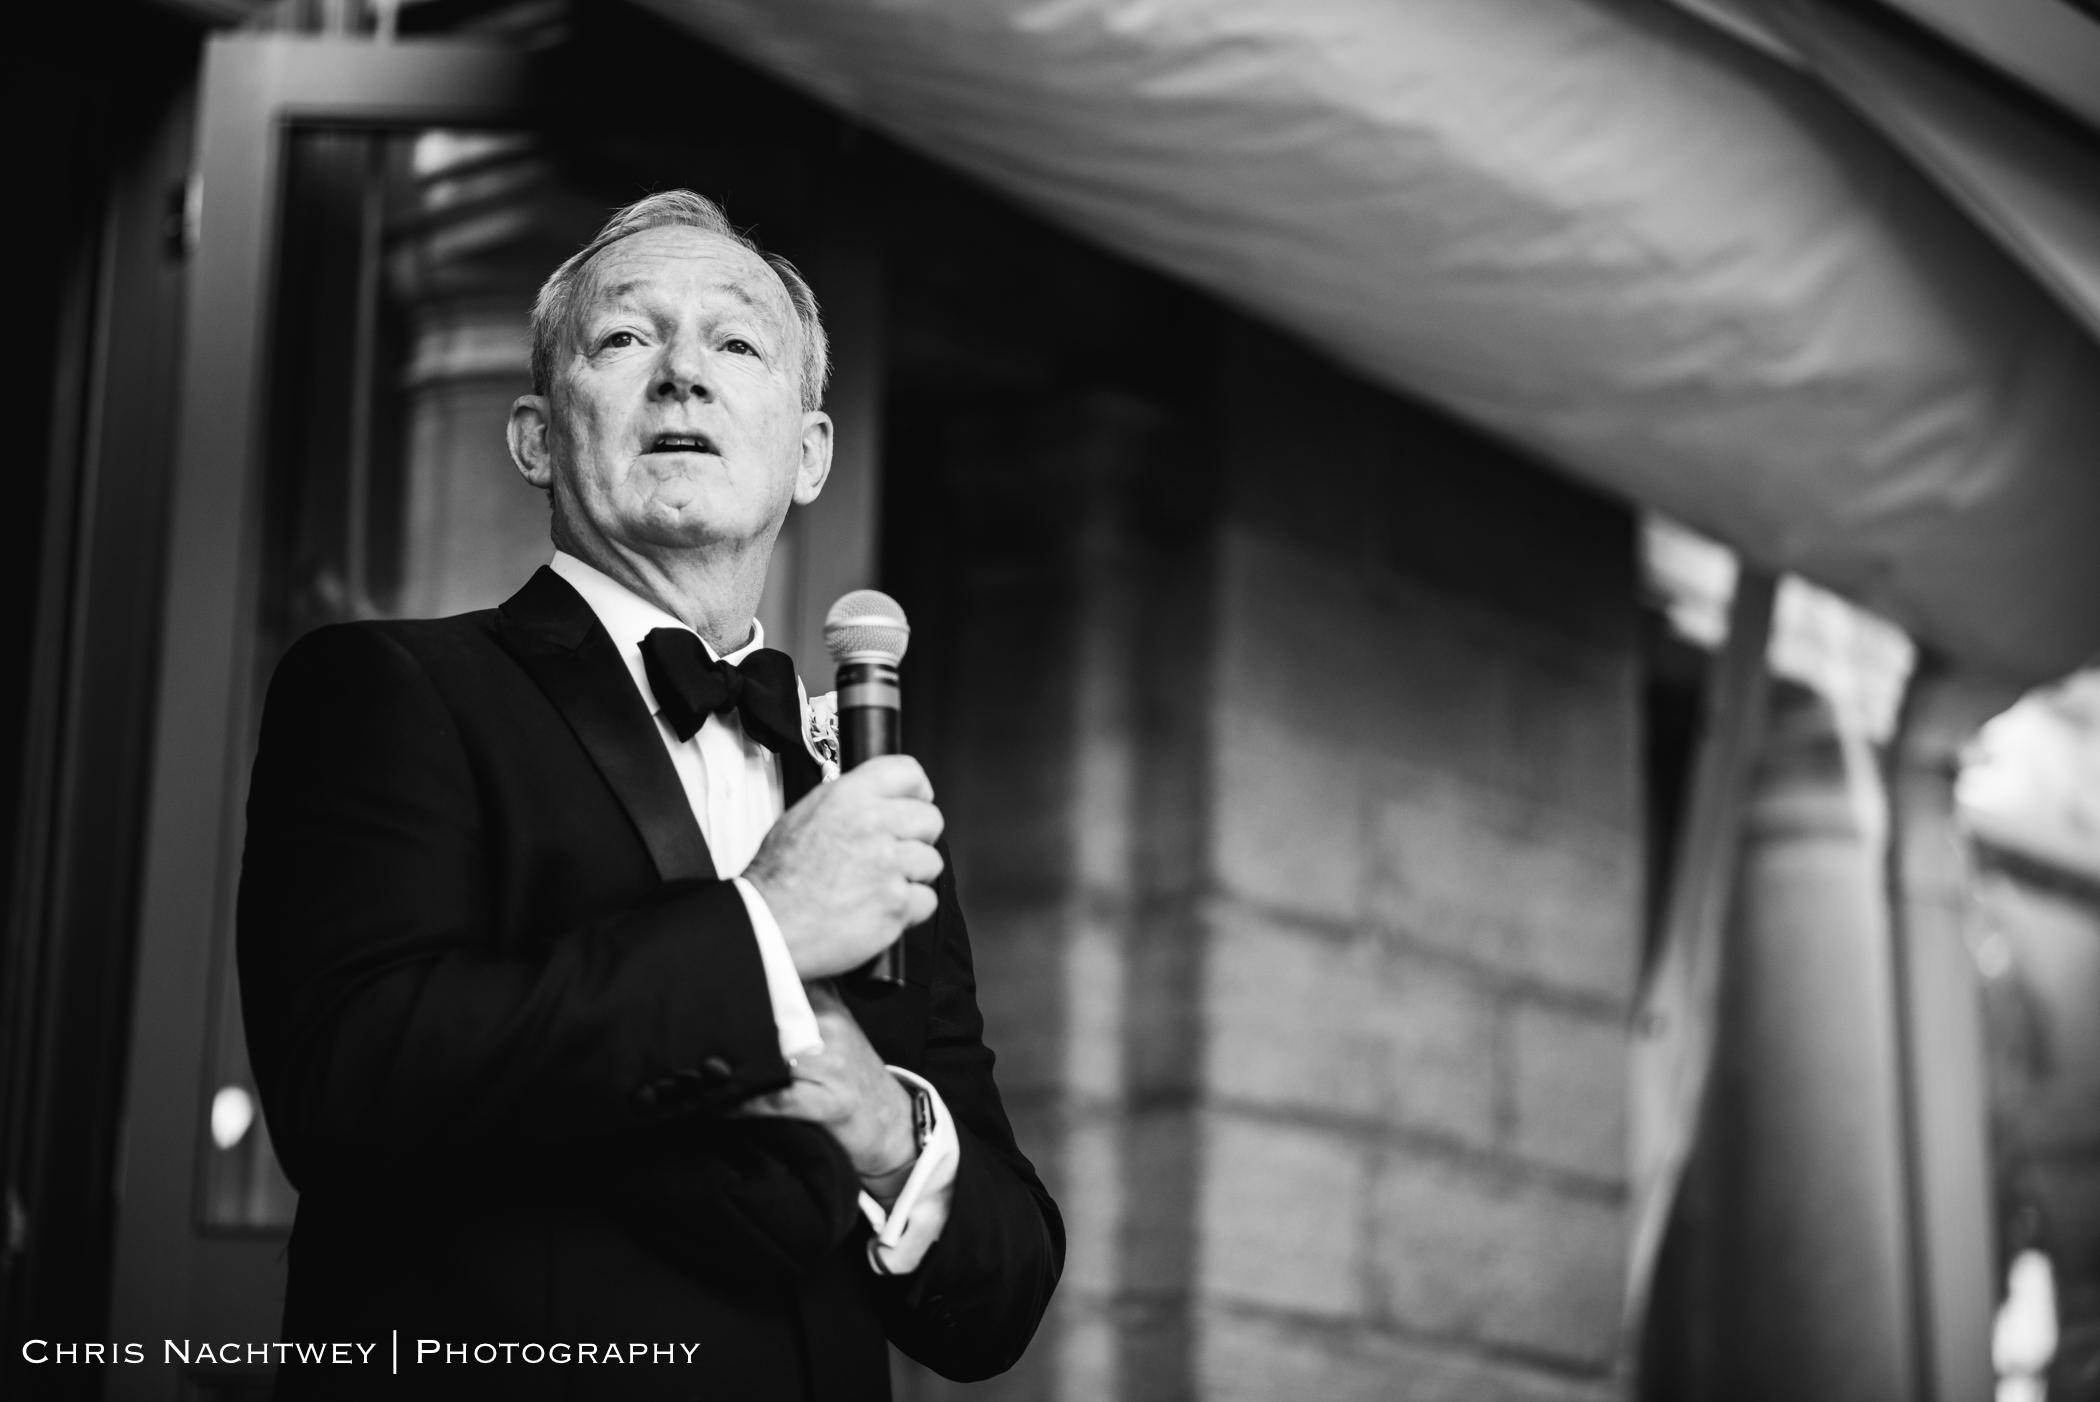 harkness-wedding-photos-chris-nachtwey-photography-2018-27.jpg